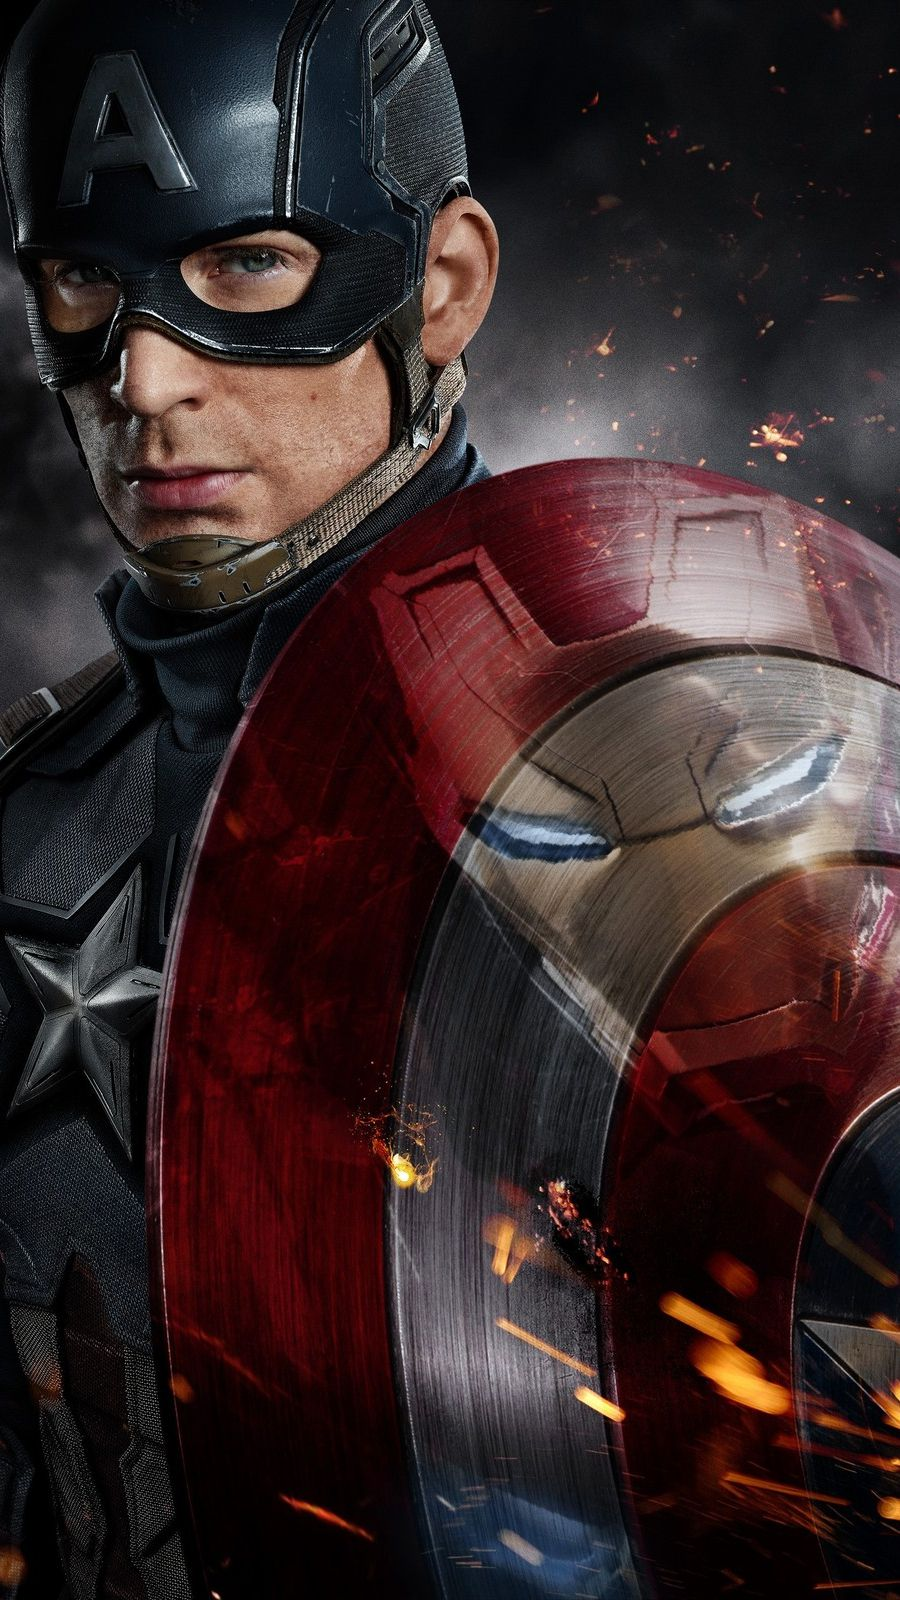 Joker Quotes Hd Wallpapers 1080p Captain America Vs Iron Man Fight Iphone Wallpaper